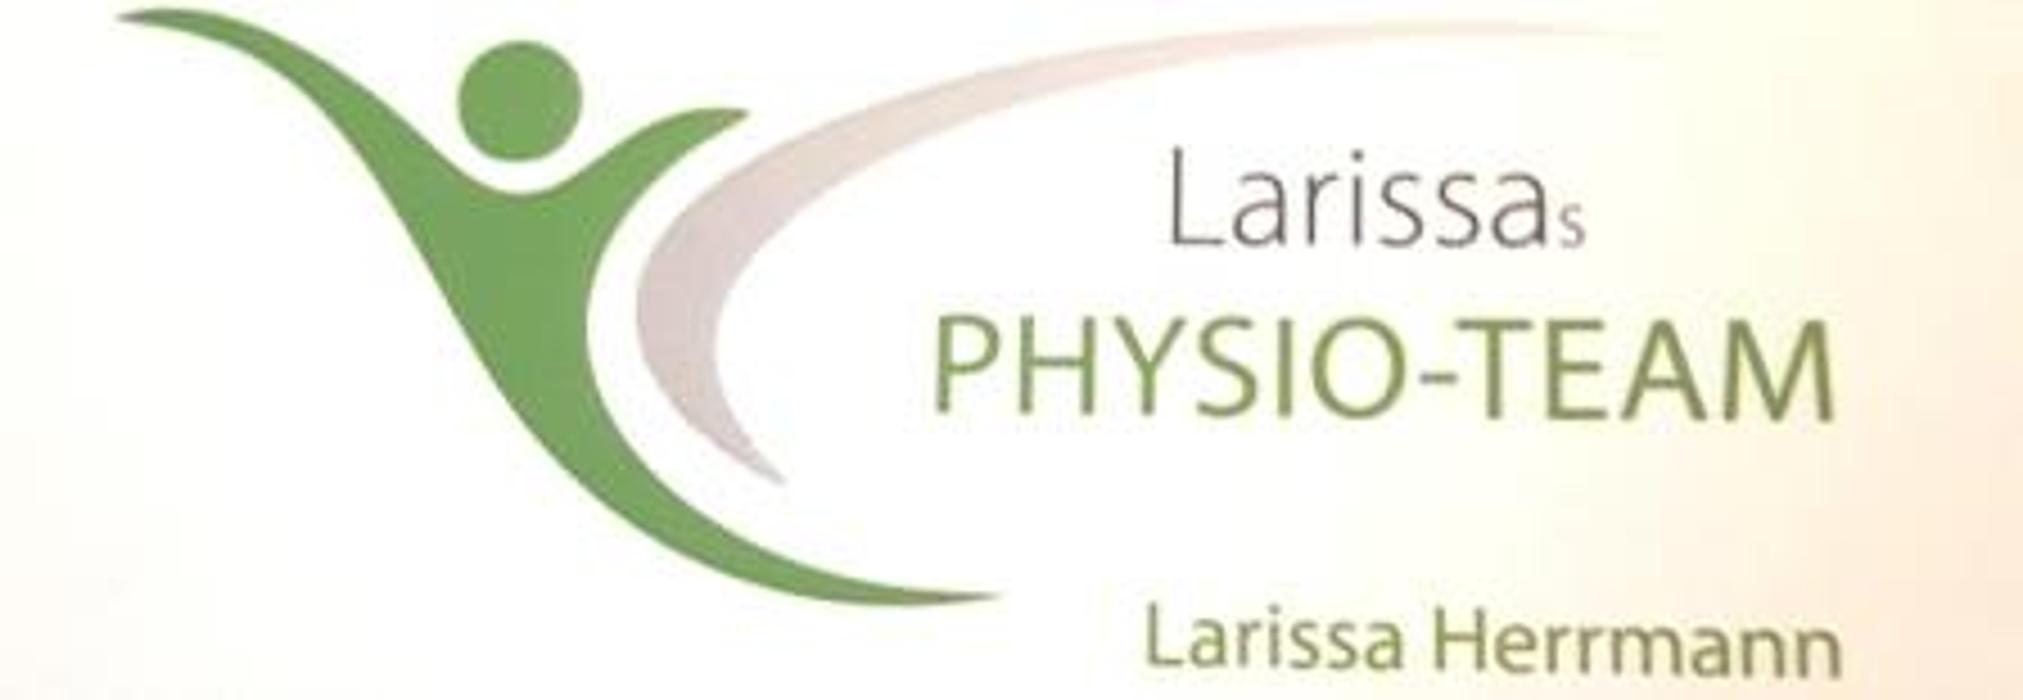 Bild zu Larissas Physio-Team in Bamberg